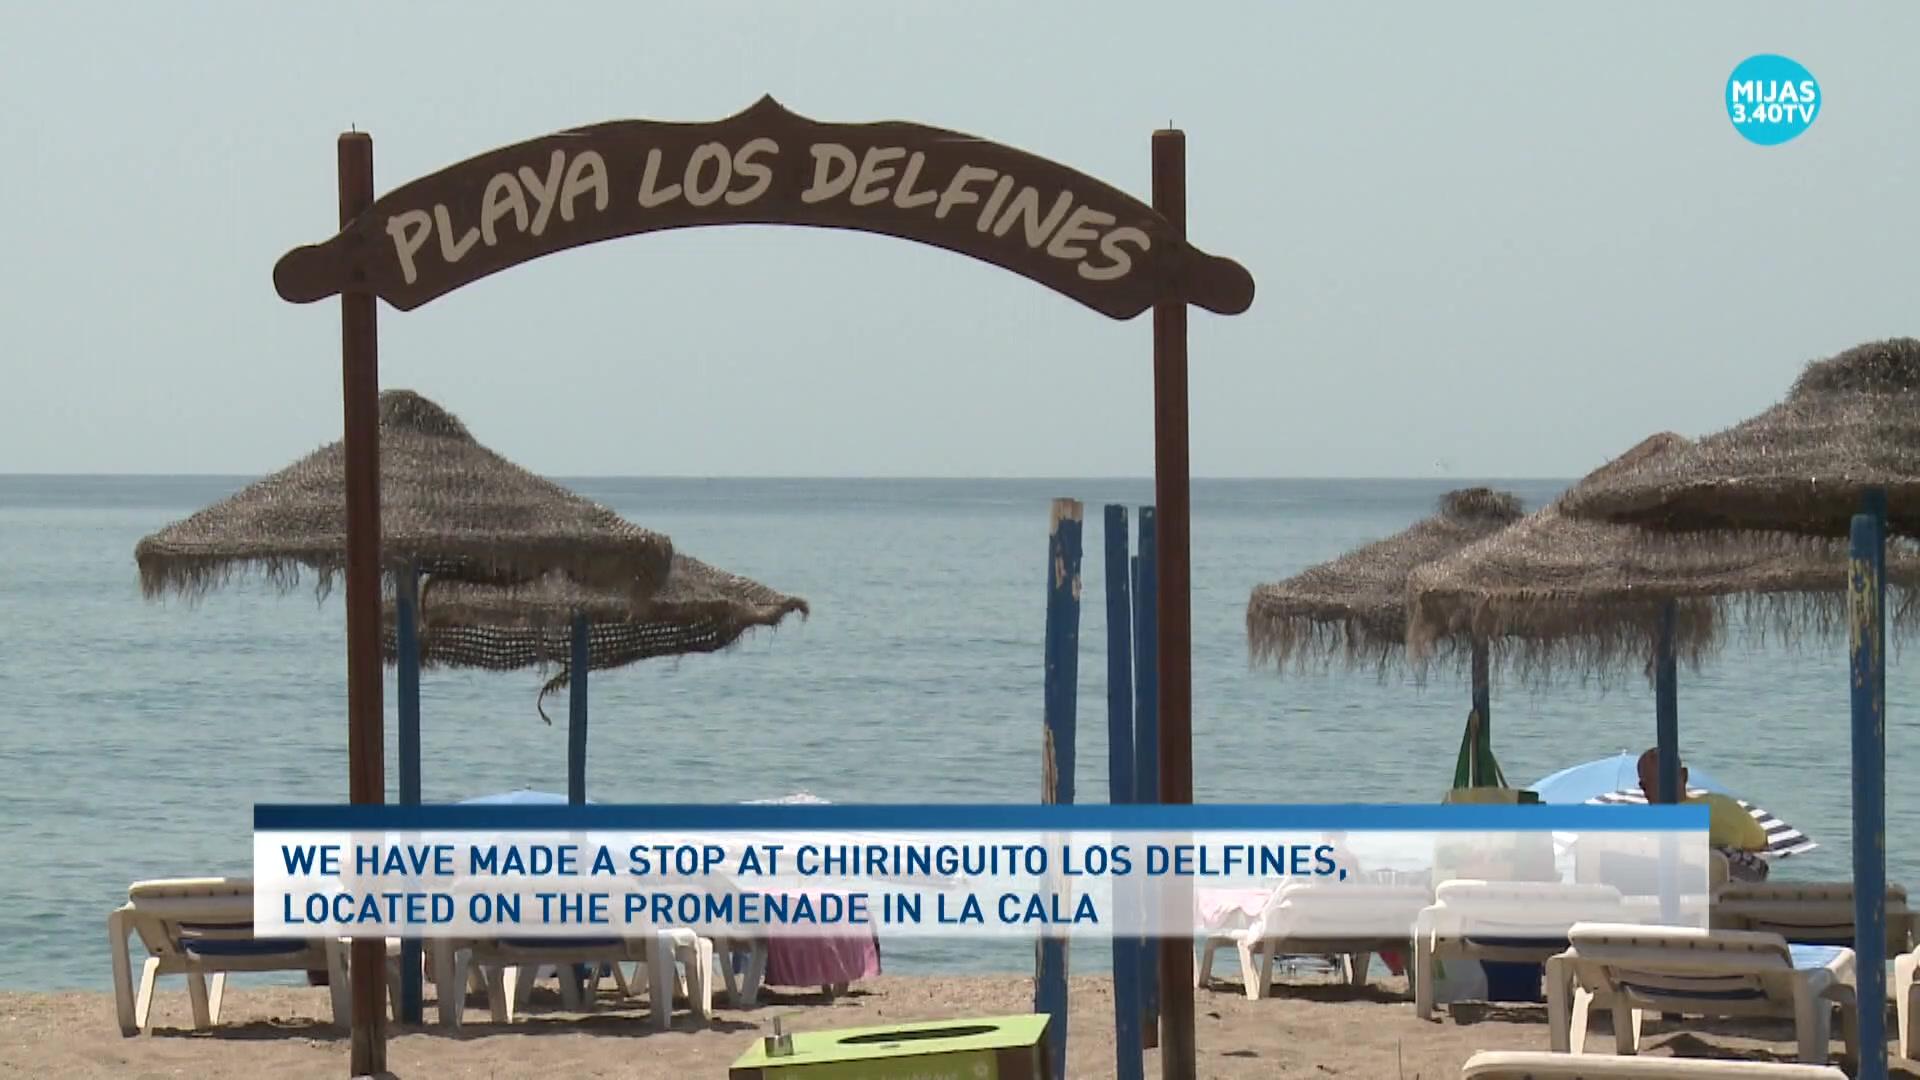 Beach bars in Mijas serve the best seafood cuisine